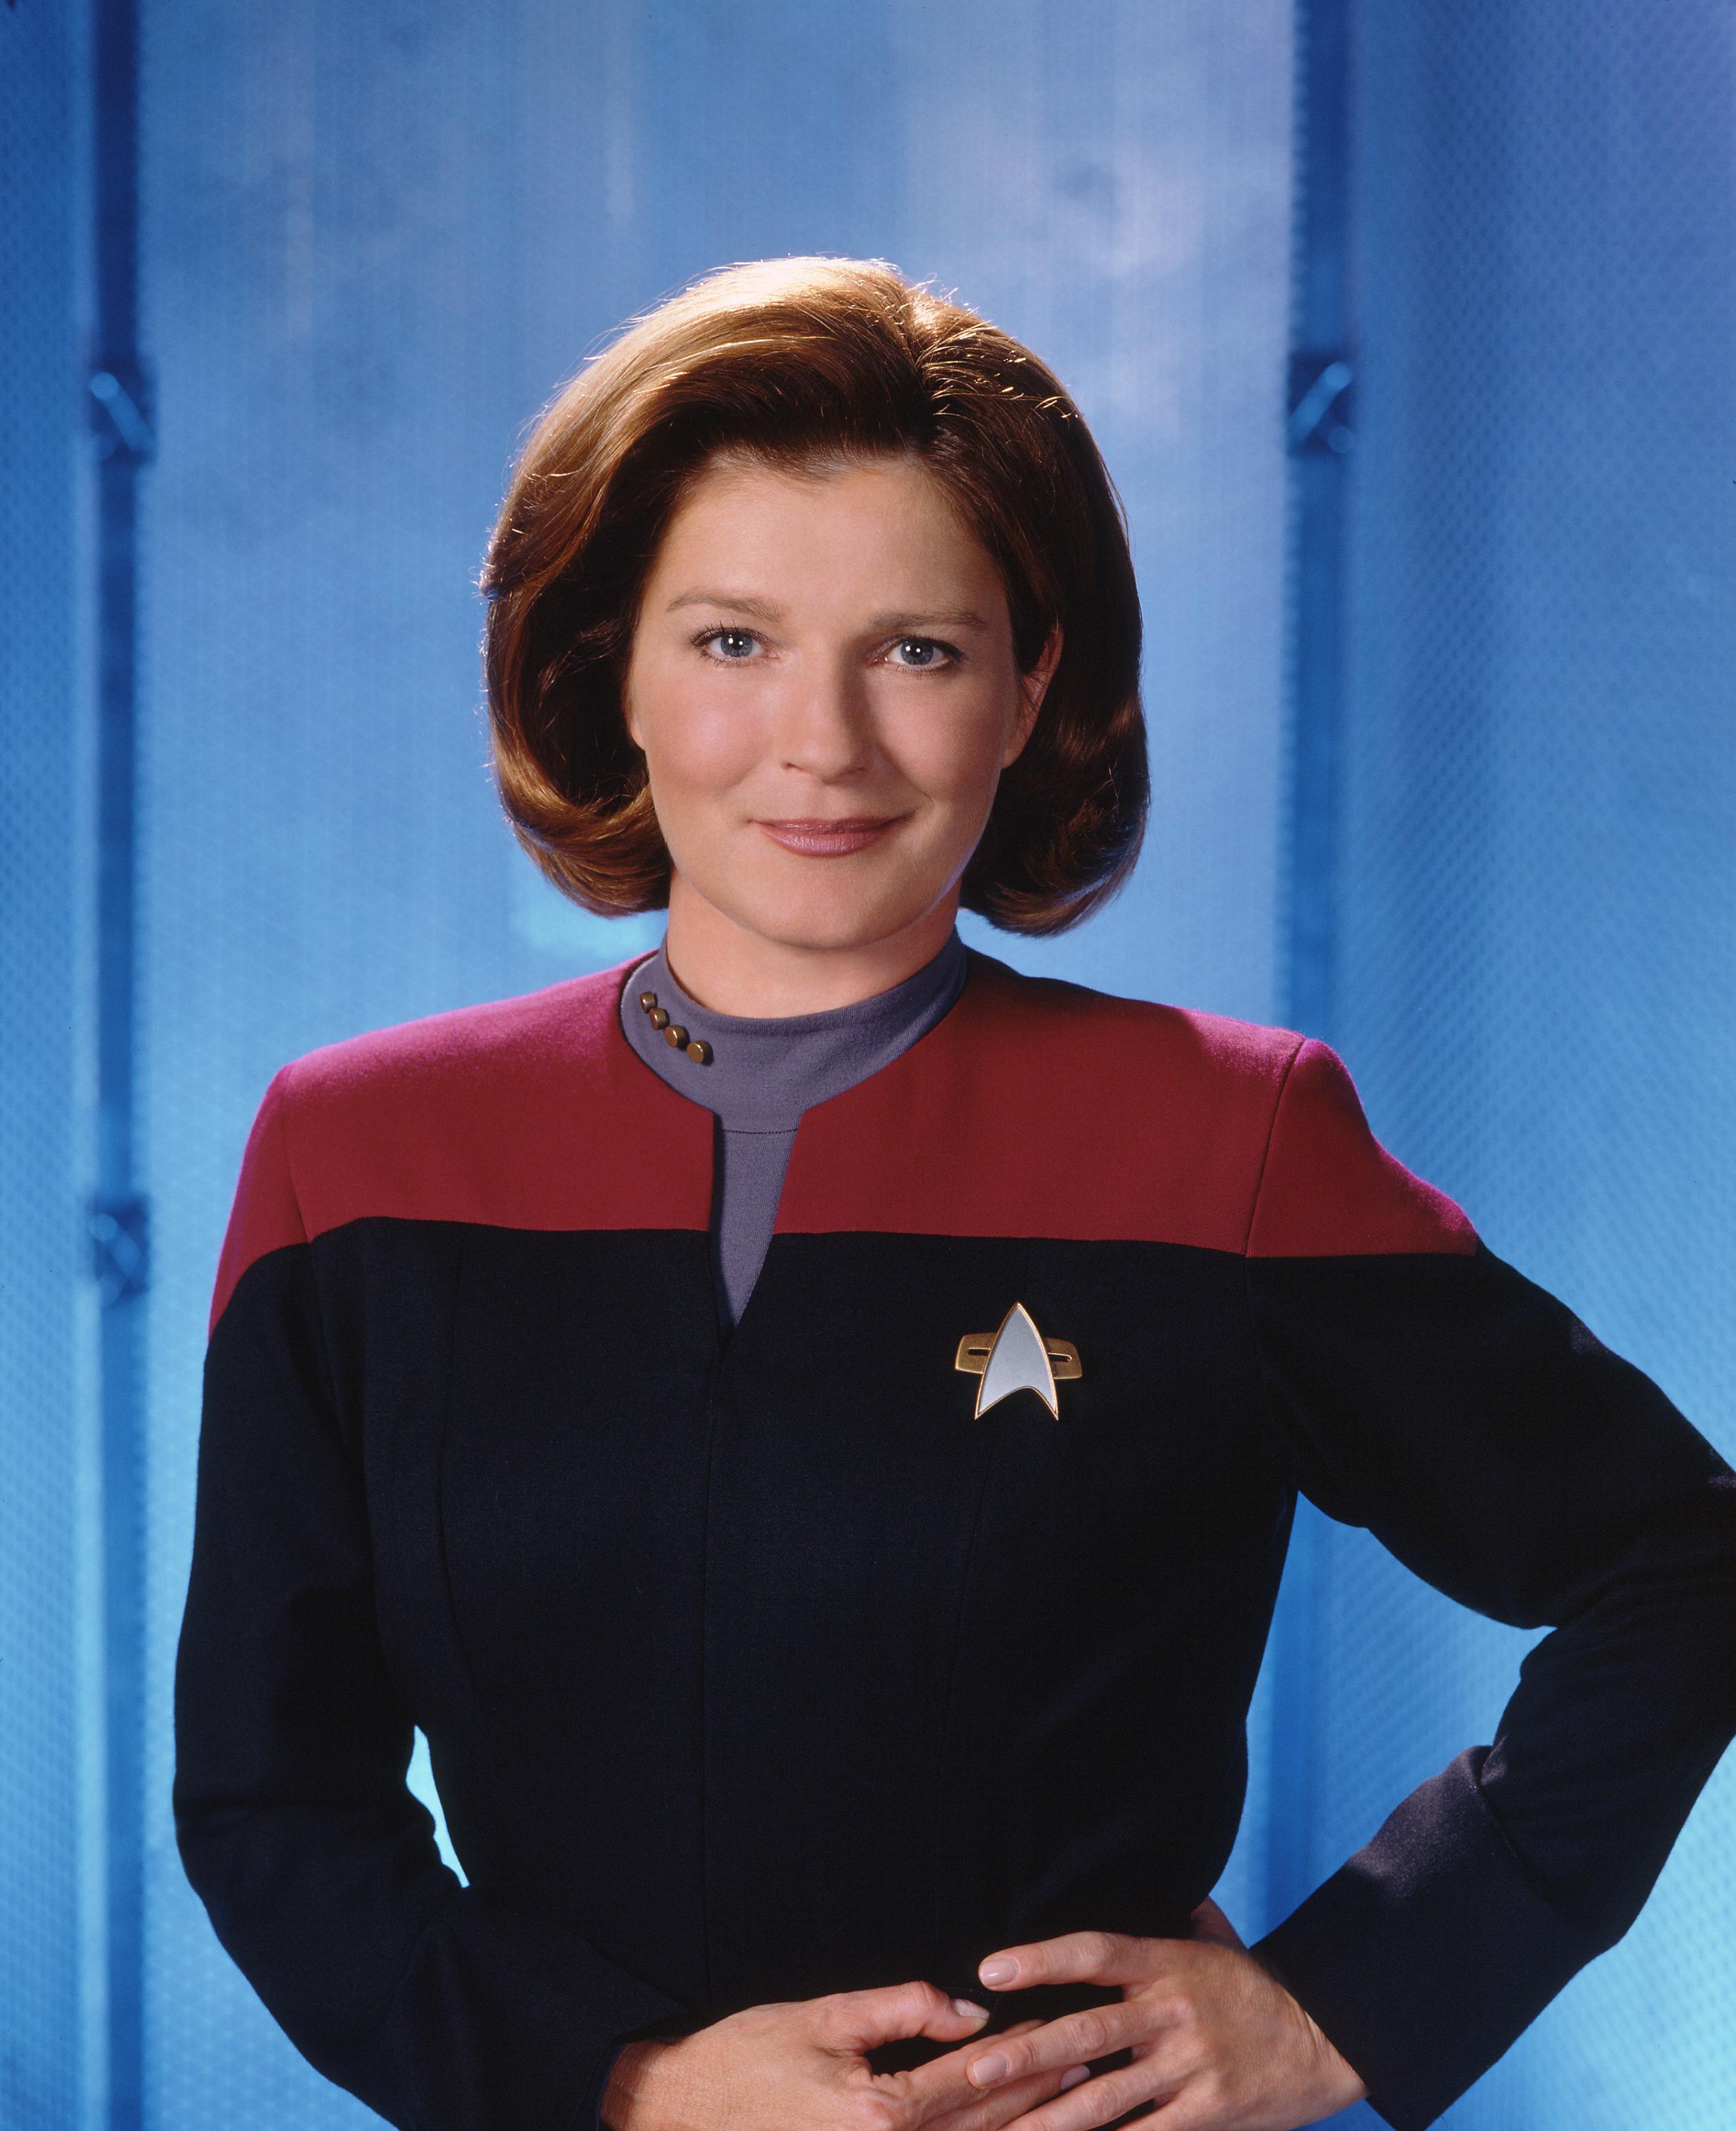 Kate Mulgrew - Star Trek Voyager